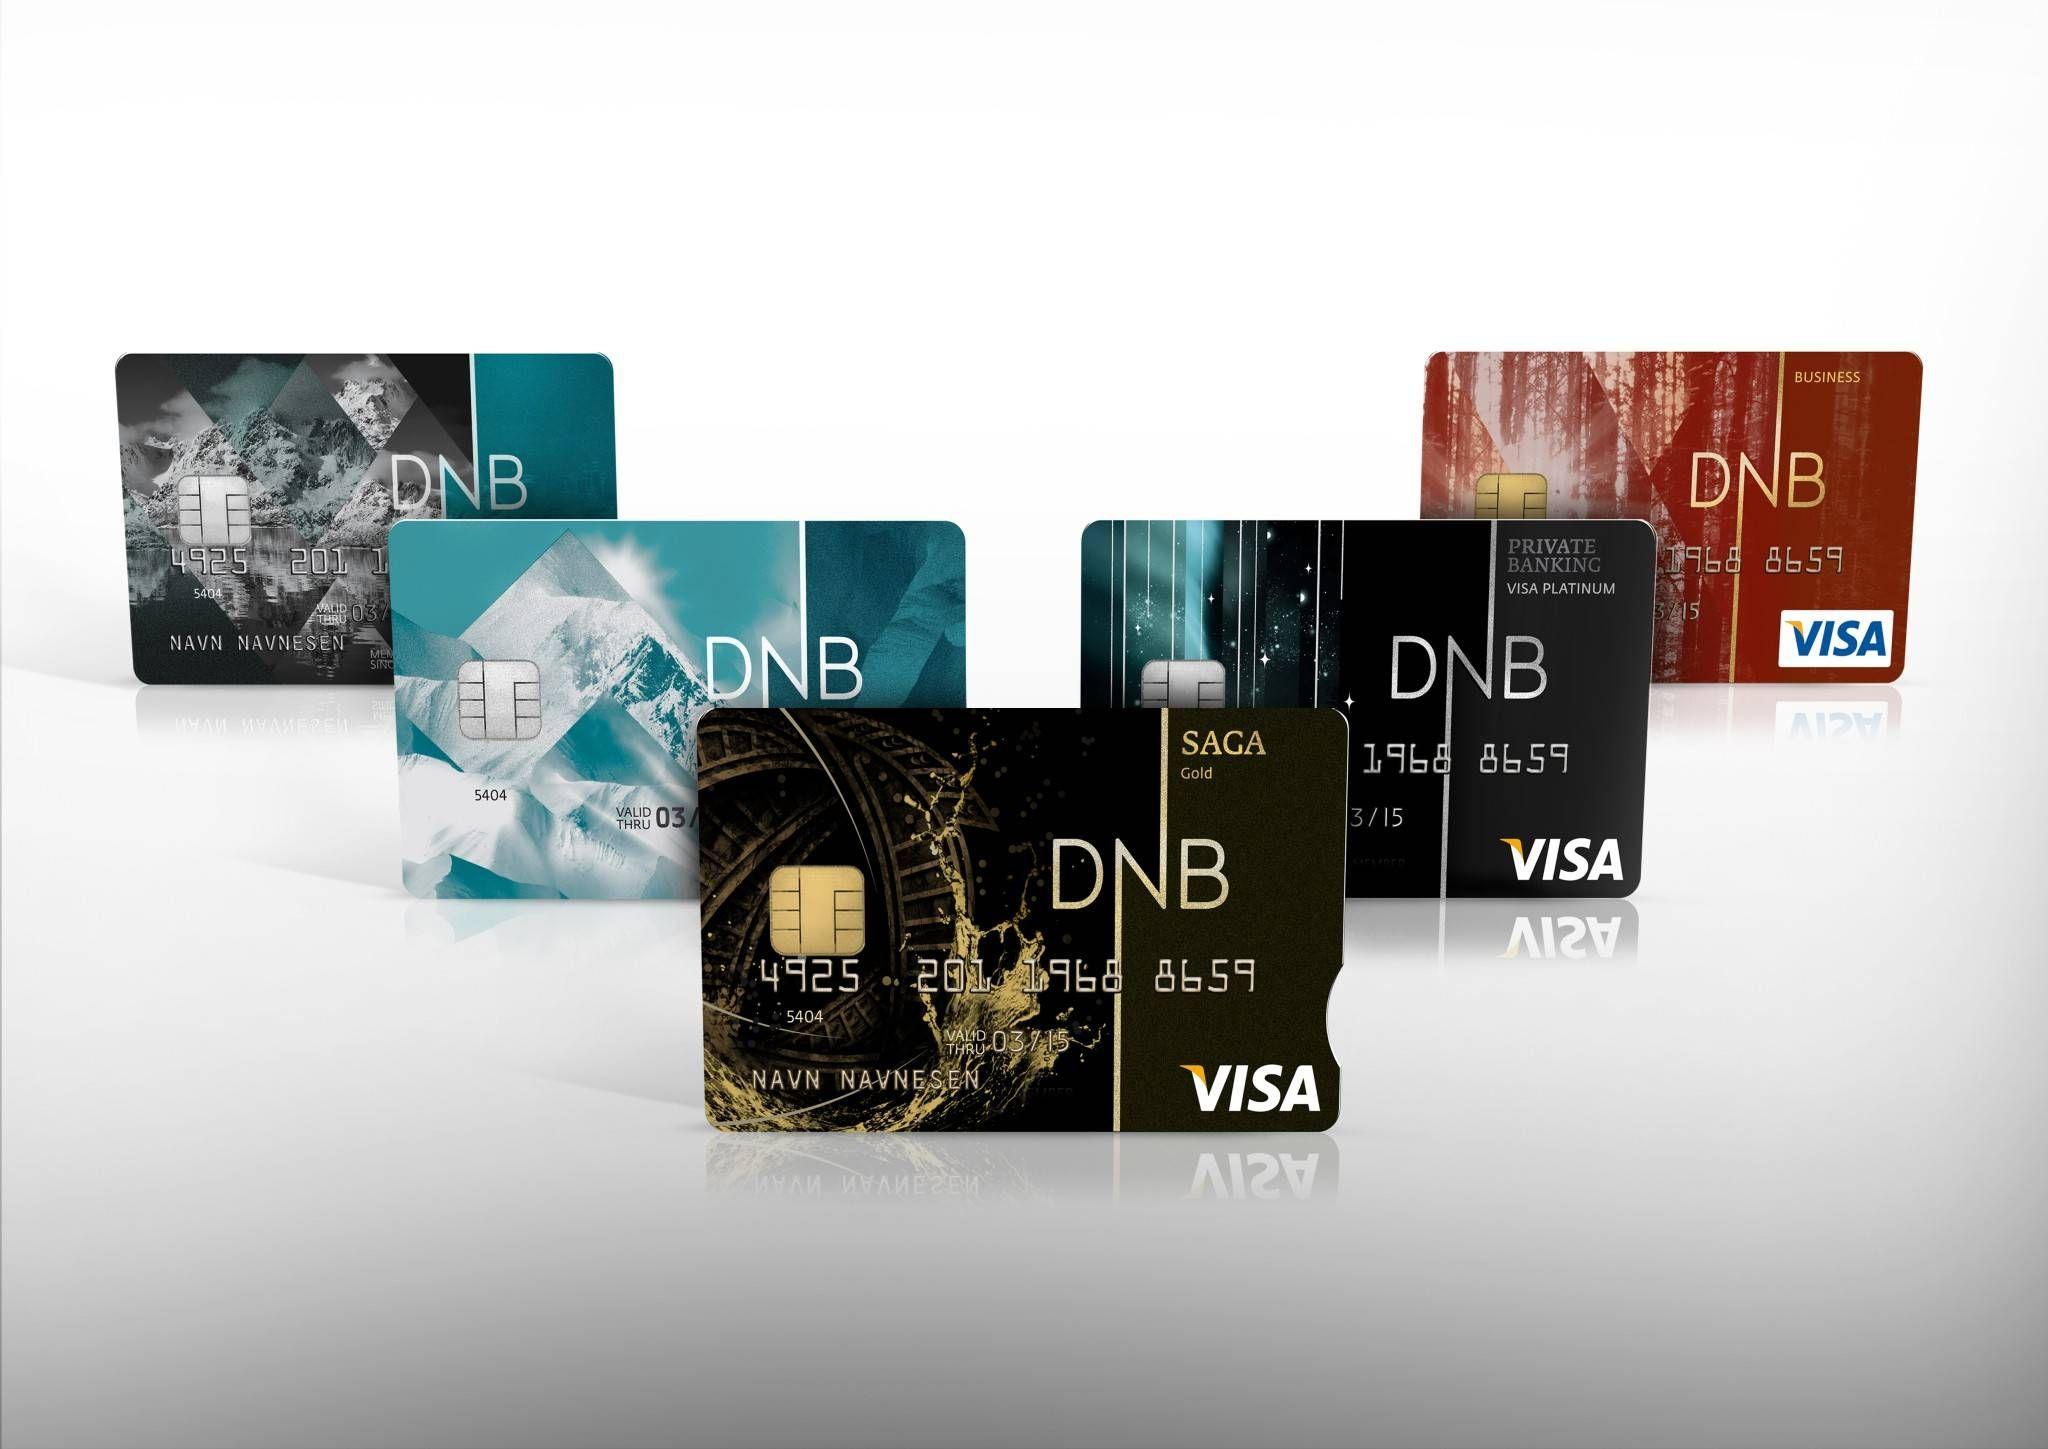 Dnb the norwegian bank snhetta r1 pinterest banks and dnb the norwegian bank snhetta reheart Images